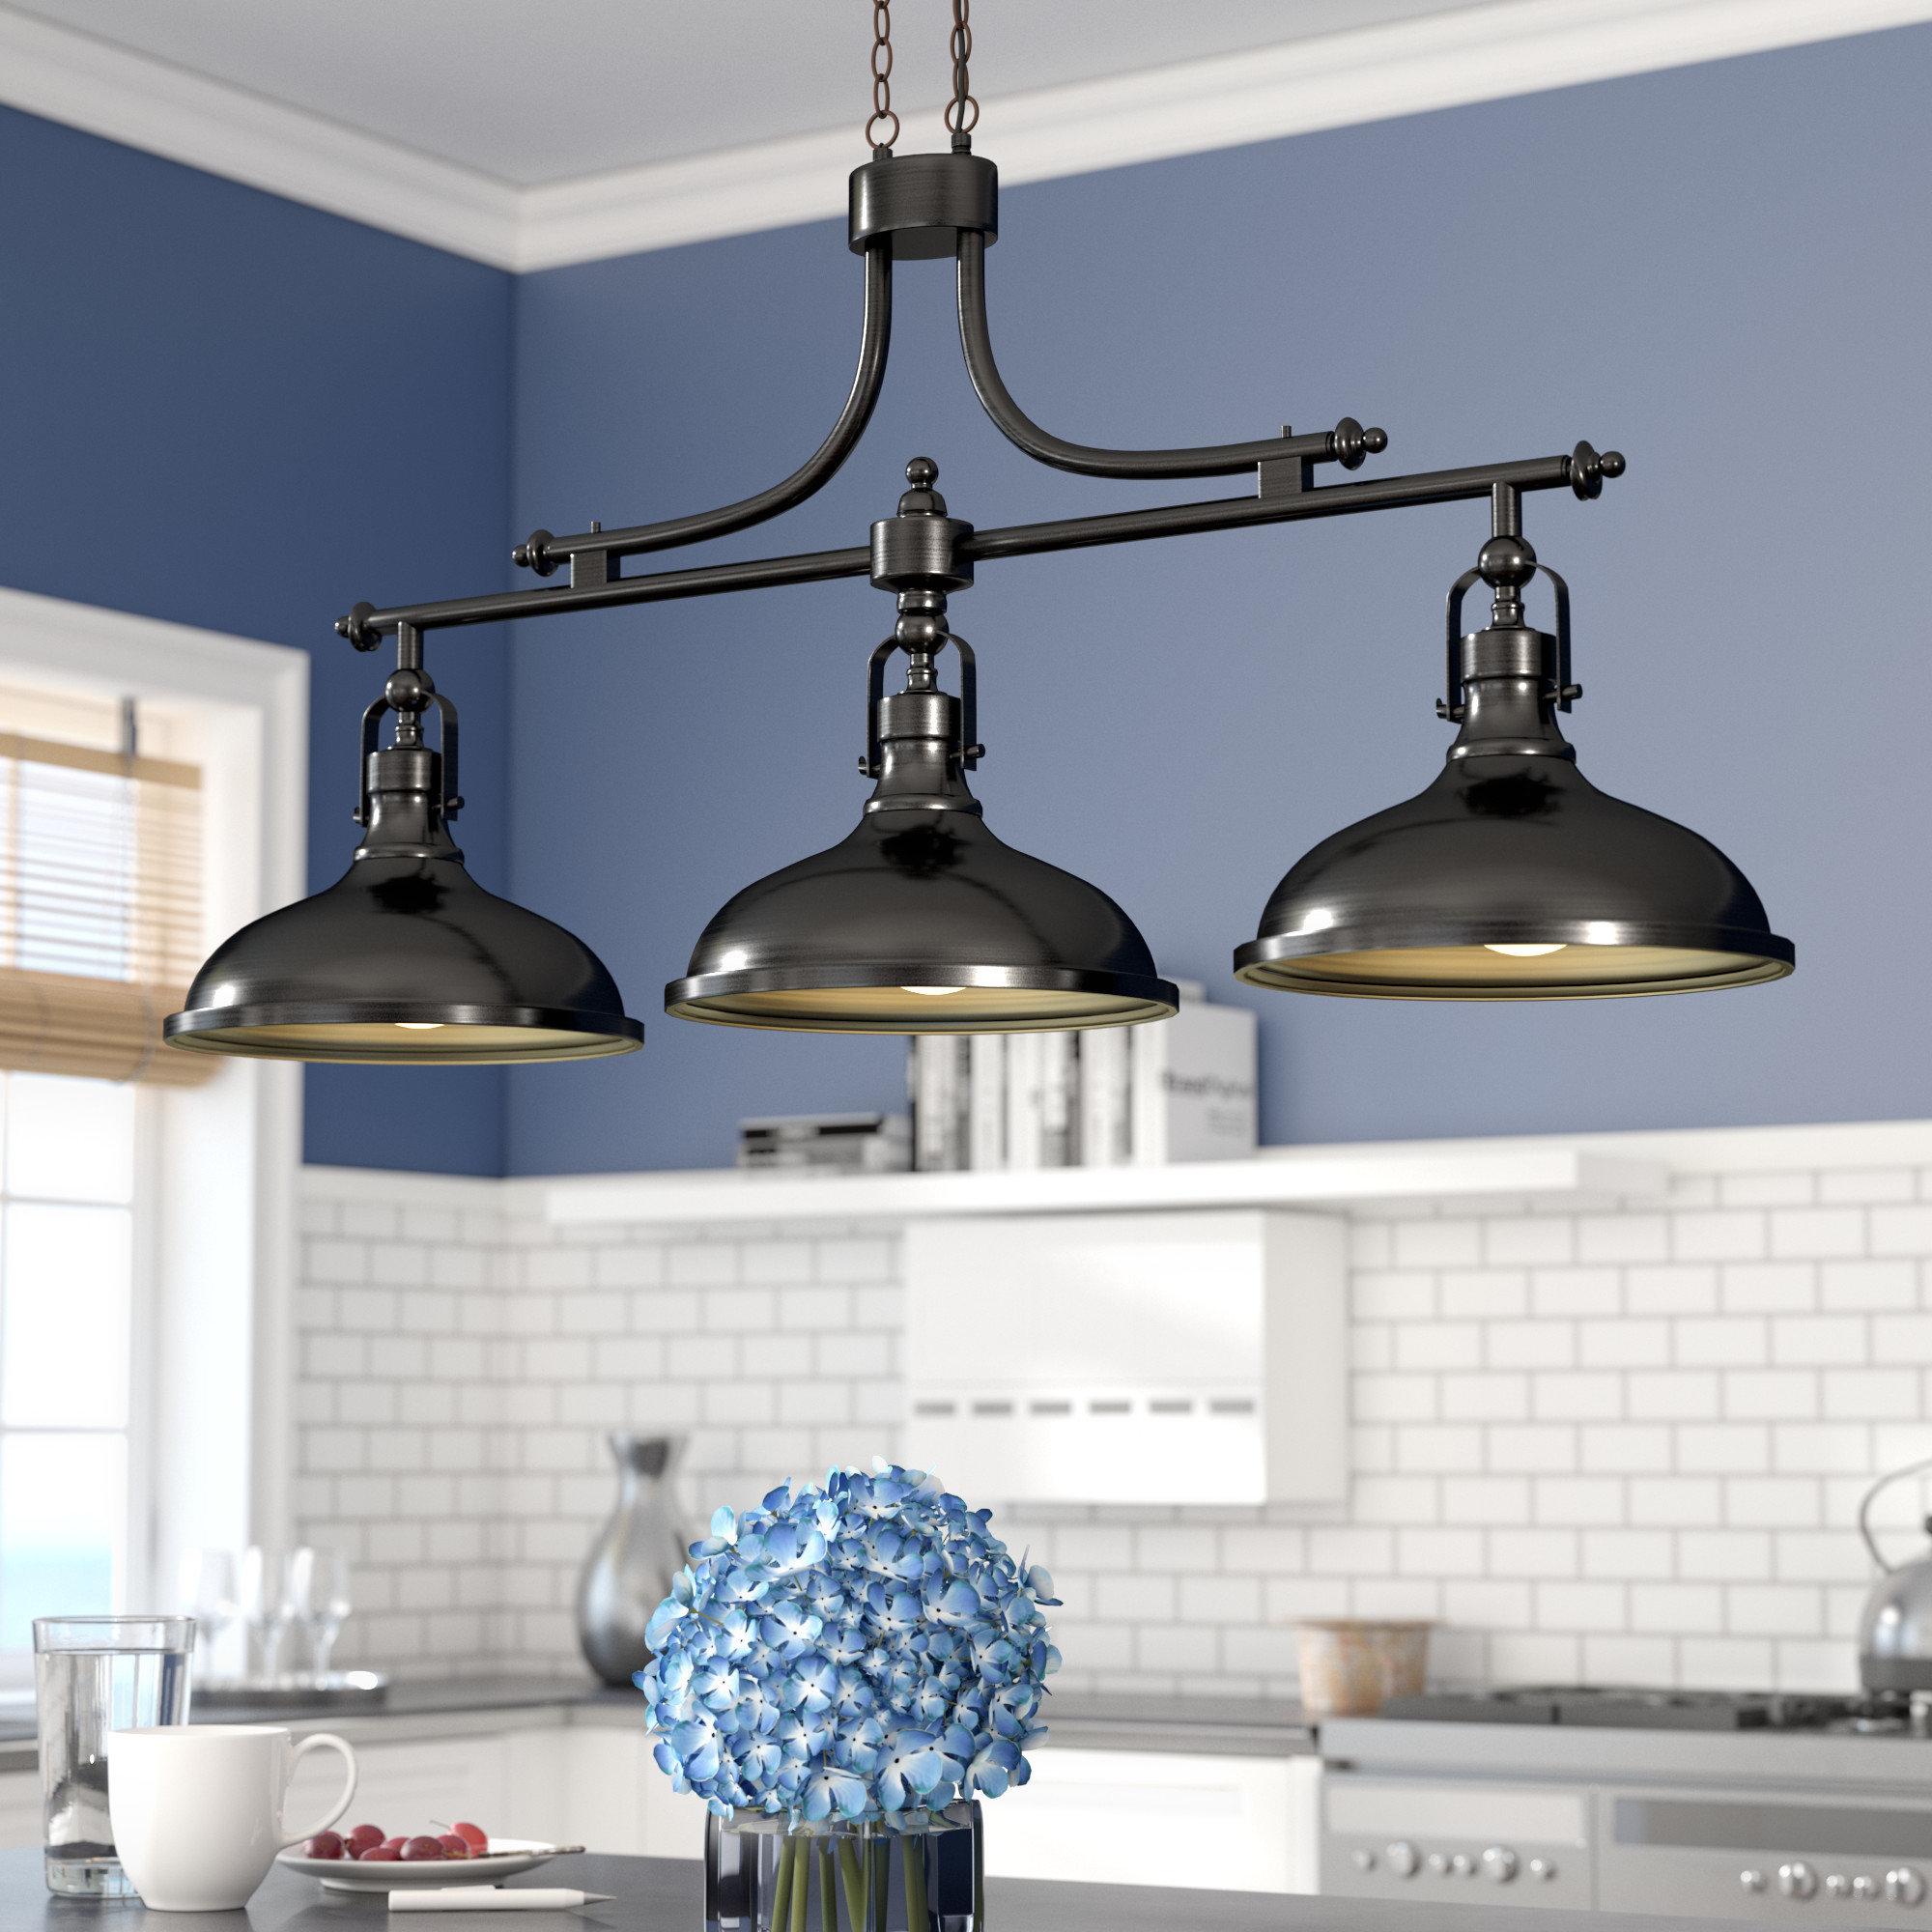 Kitchen Island Pendant Lighting Fixtures – Gnubies Pertaining To Ariel 2 Light Kitchen Island Dome Pendants (Image 20 of 30)